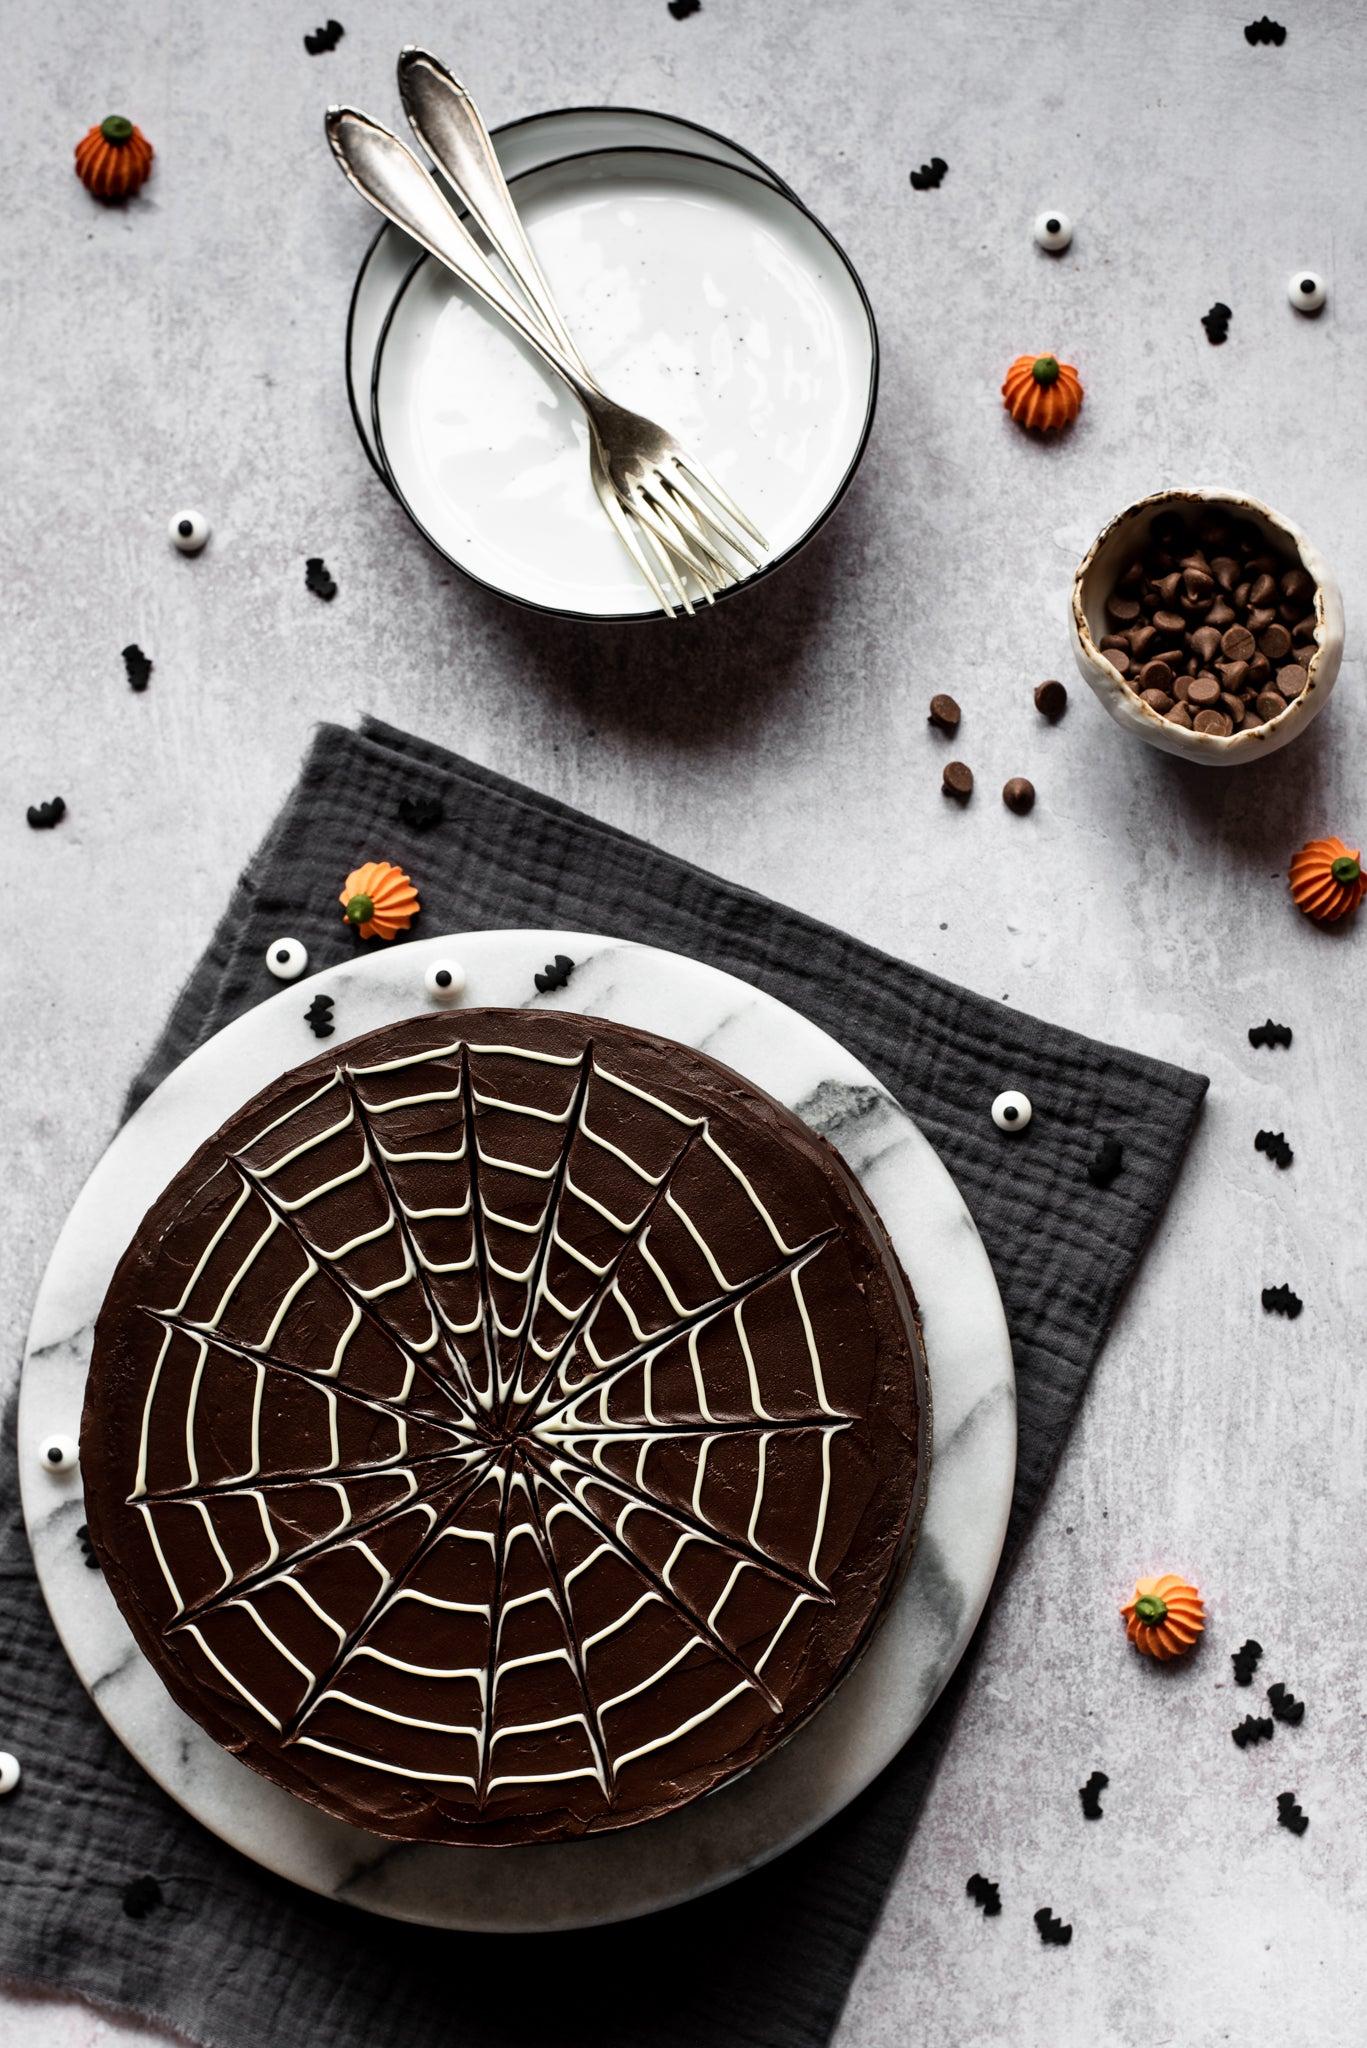 Spider-Web-Cake-WEB-RES-3.jpg